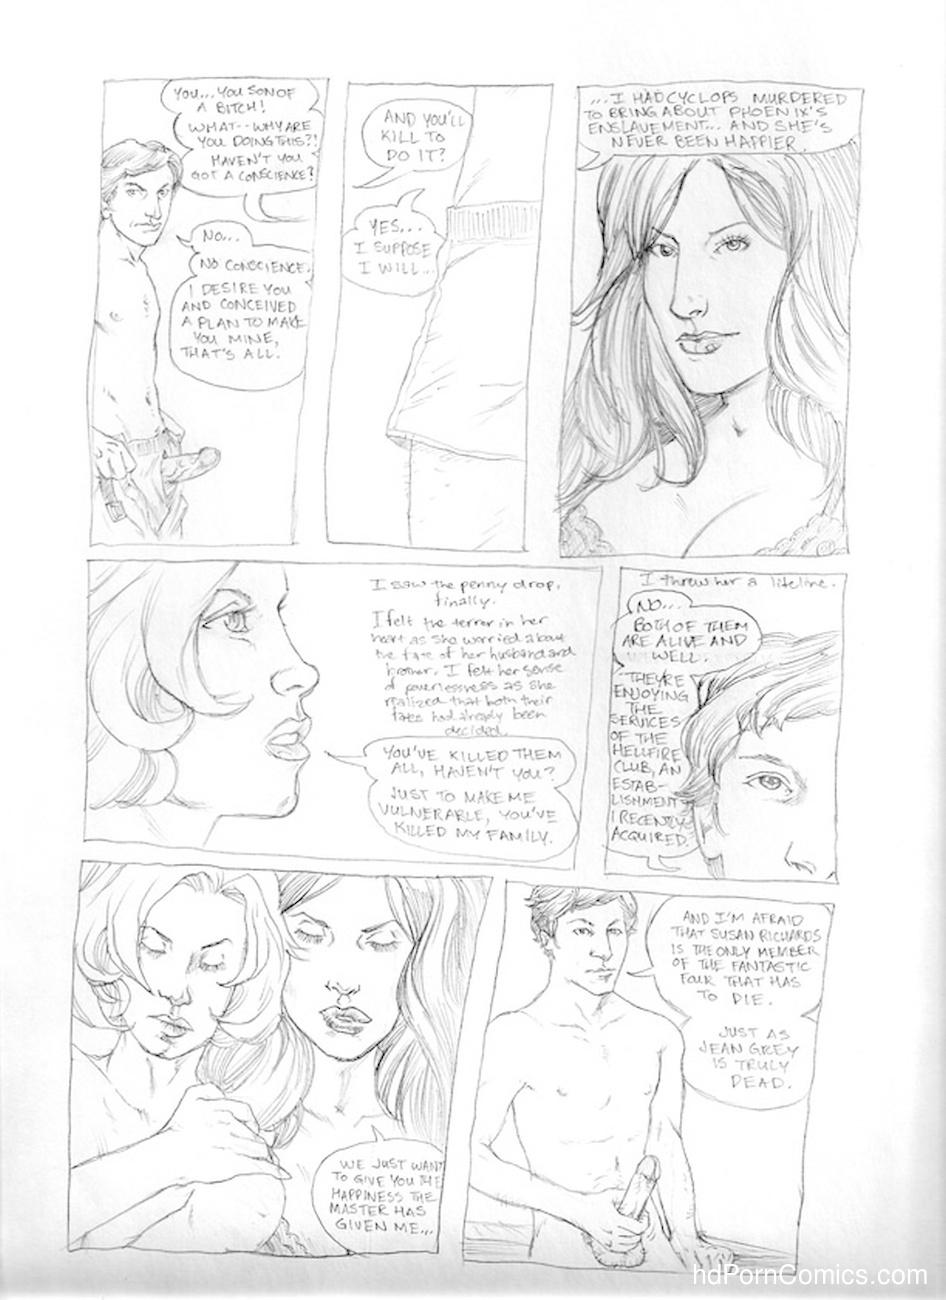 Submission Agenda 5 - The Invisible Woman 12 free sex comic